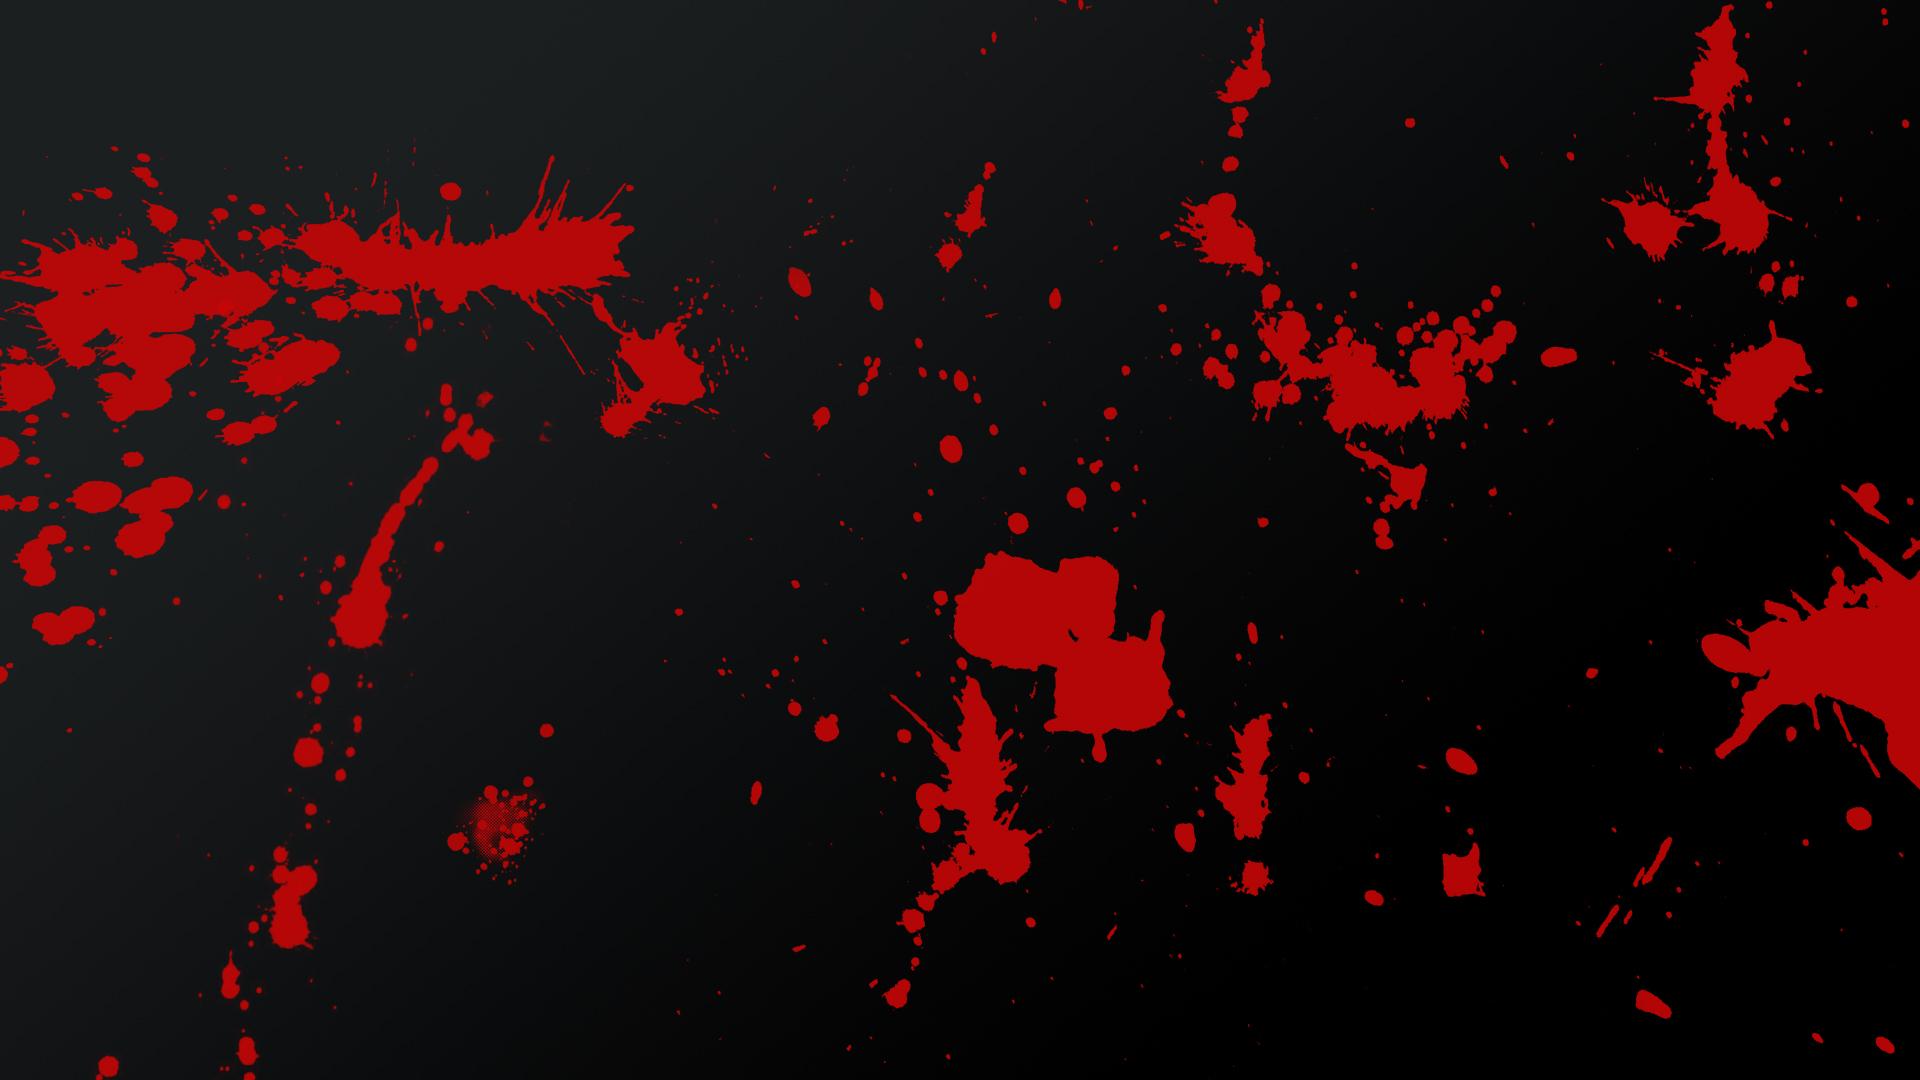 Blood splatter background by Pudgey77 on DeviantArt